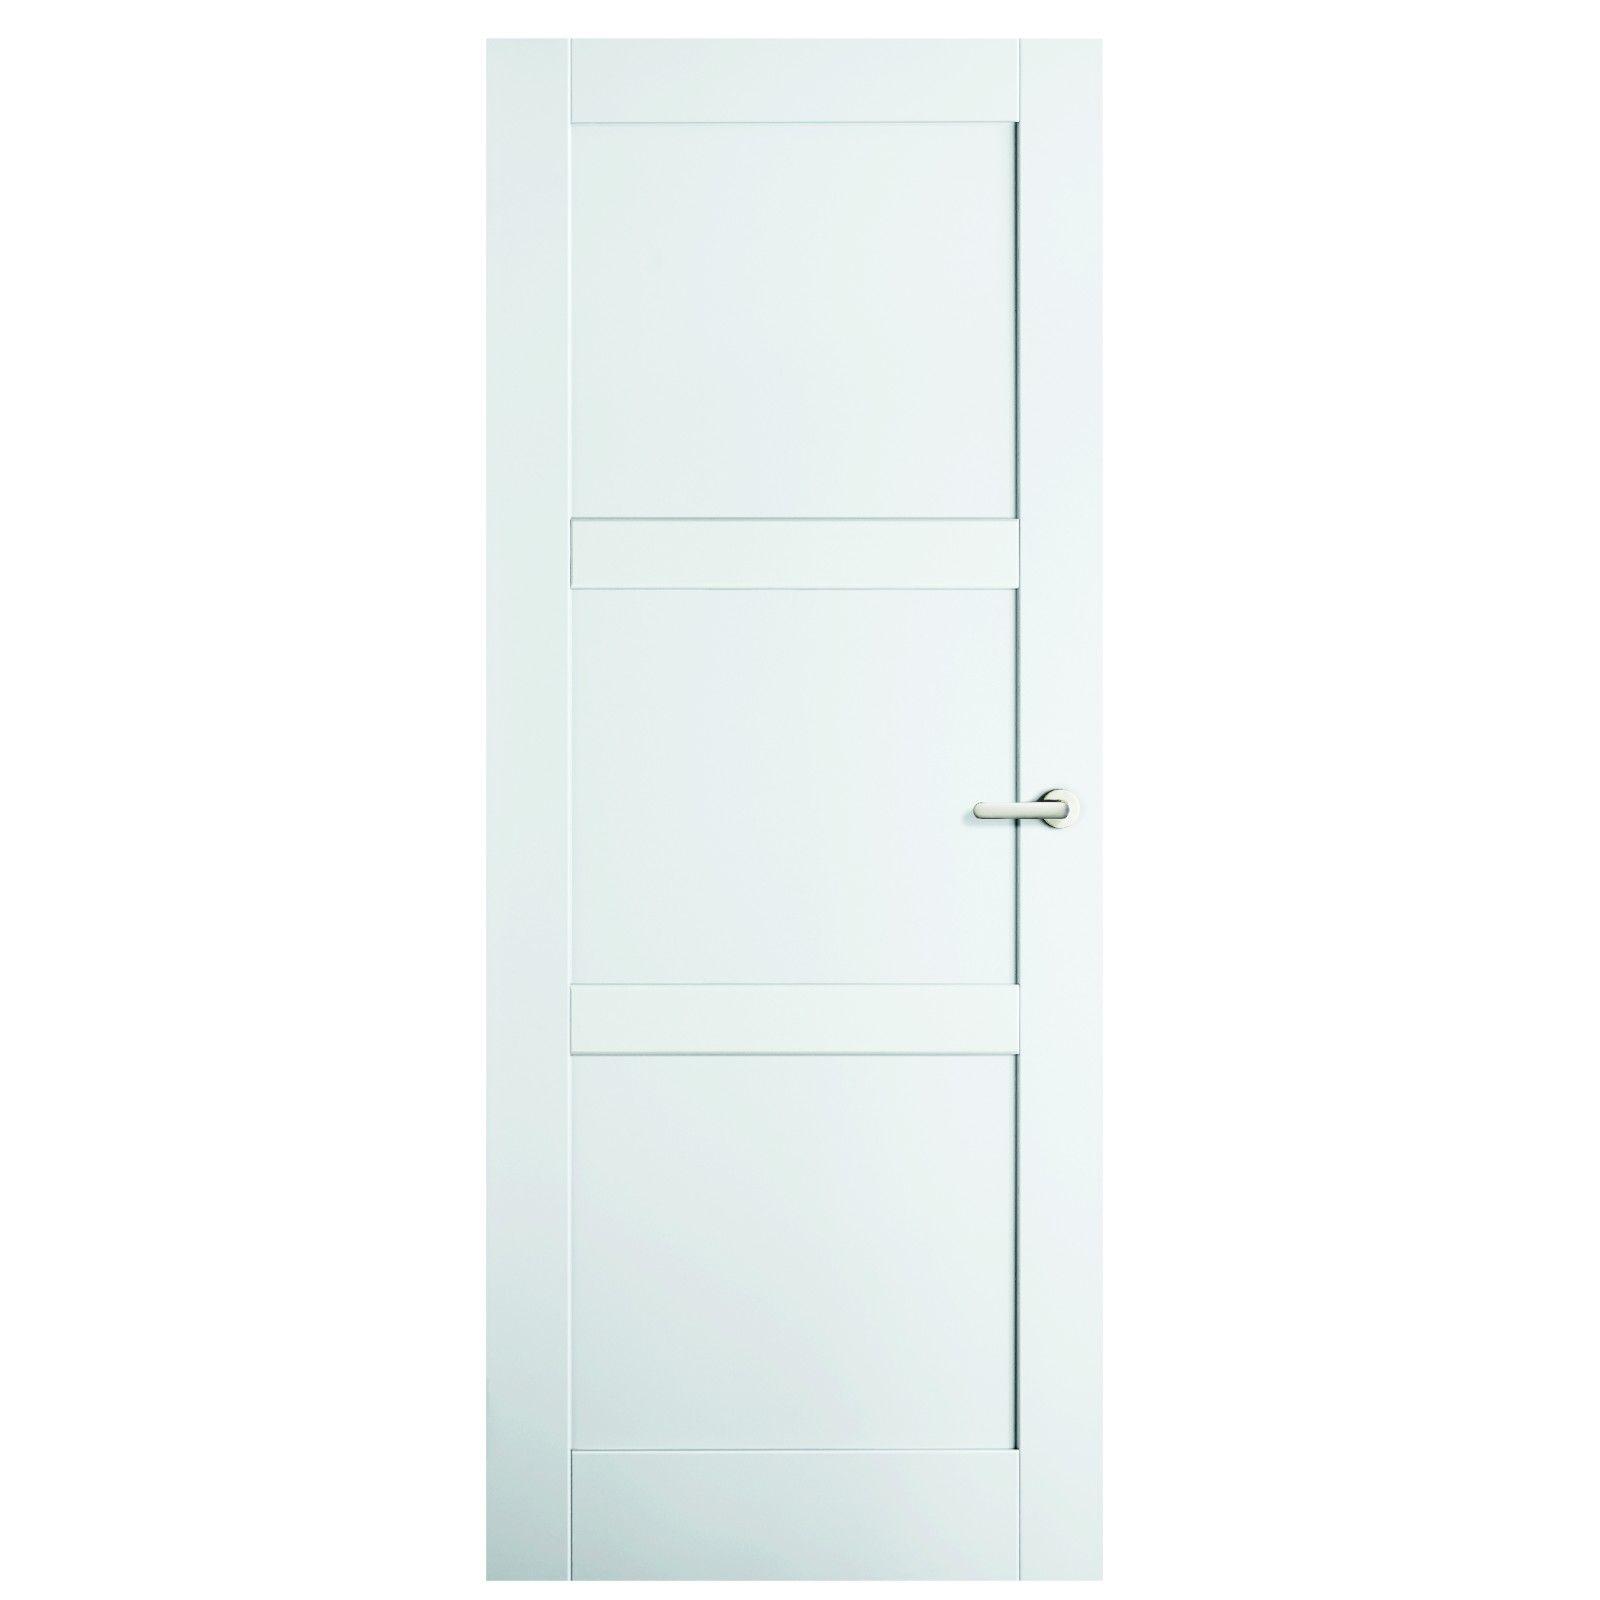 Corinthian Doors 2040 X 820 X 35 Moda Pmod10 Internal Door Internal Doors Tall Cabinet Storage Windows And Doors